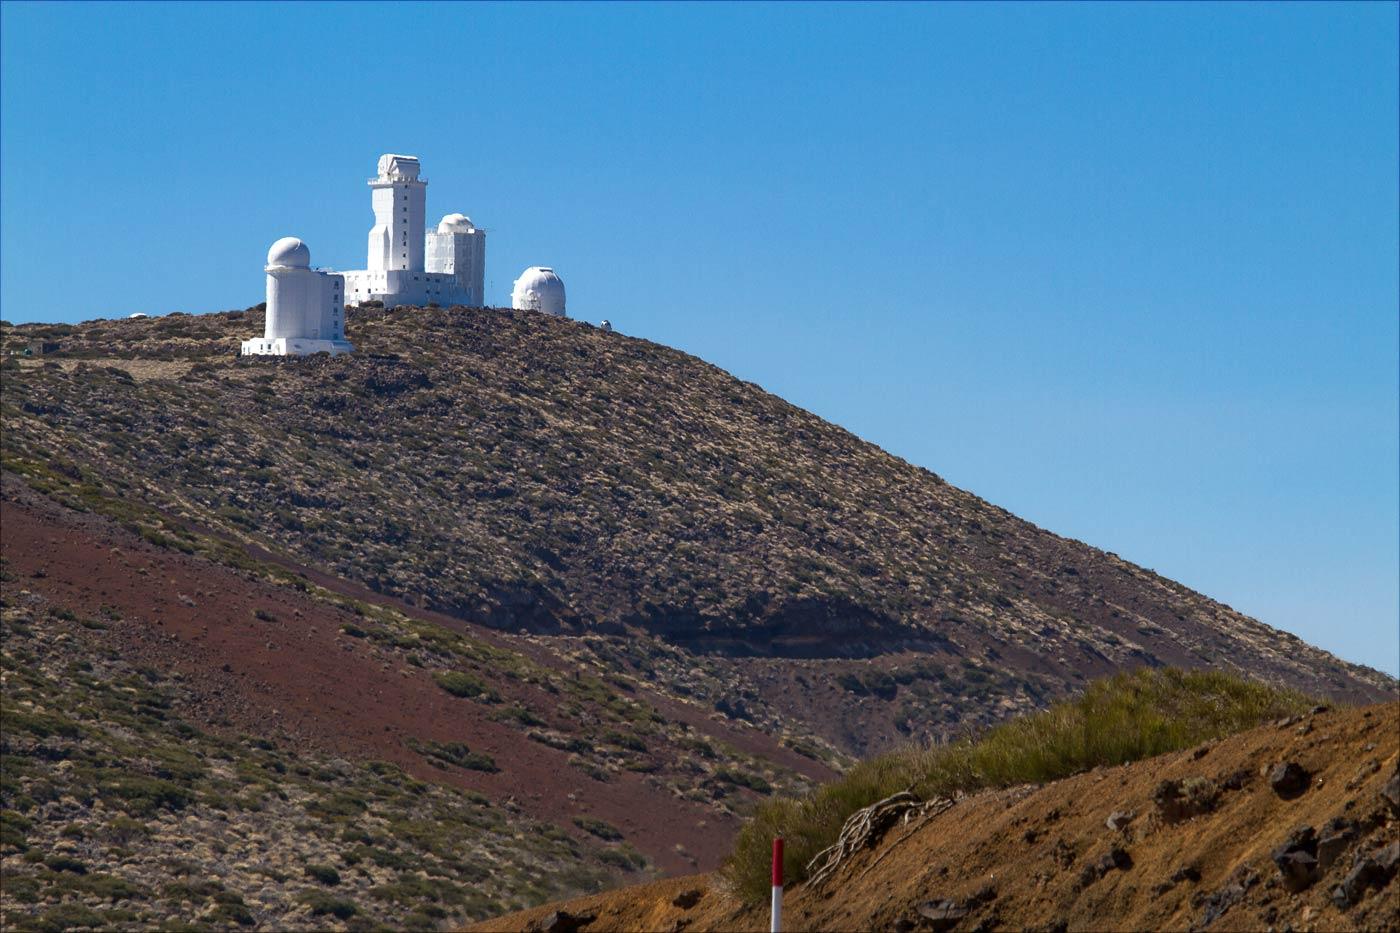 Астрономическая обсерватория на вулкане Тейде